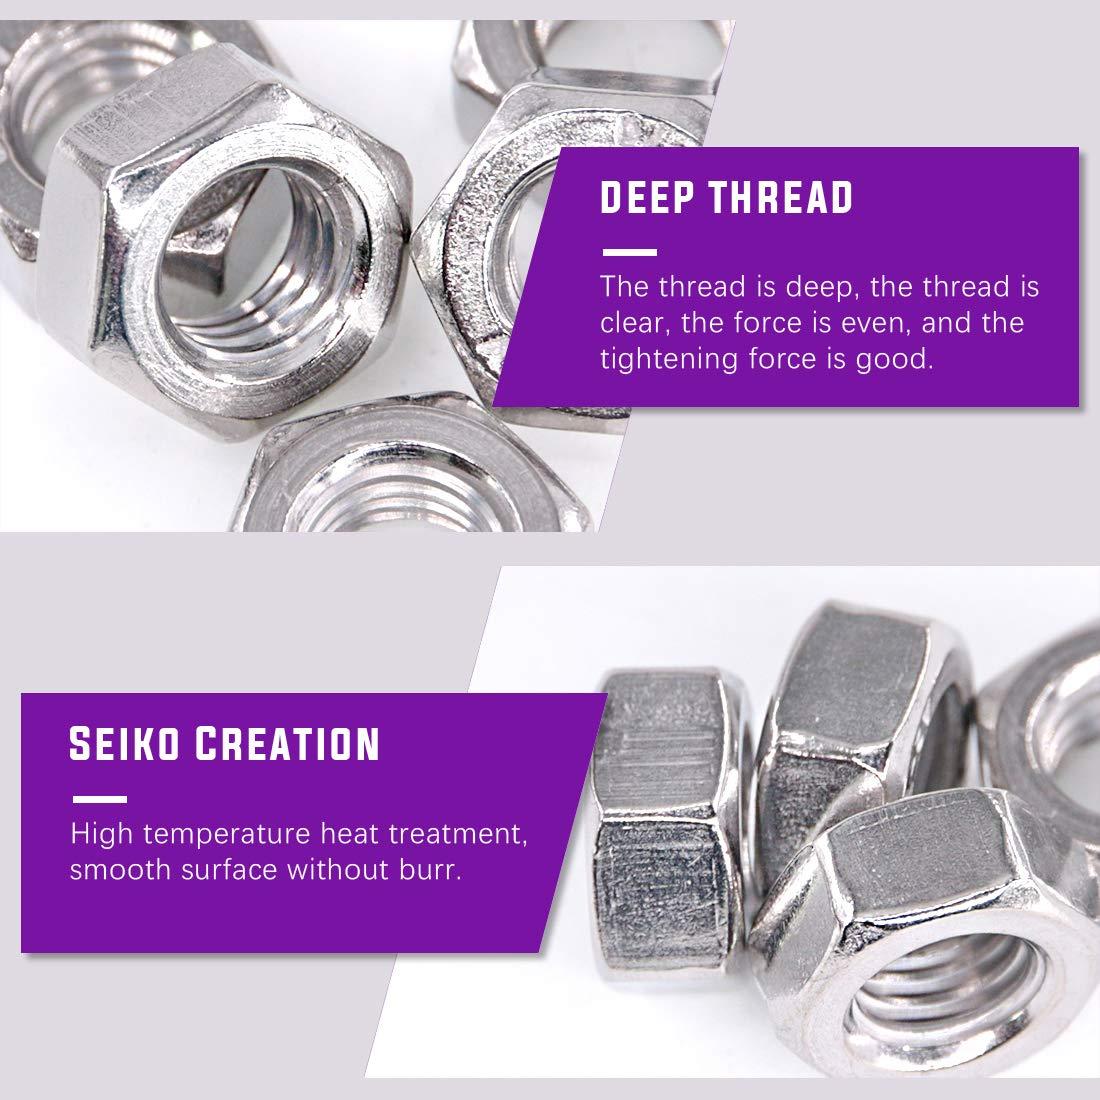 Coarse Thread Hexagon Nut 9 Sizes M2 M2.5 M3 M4 M5 M6 M8 M10 M12 Swpeet 20Pcs M12 Metric 304 Stainless Steel Hex Nuts